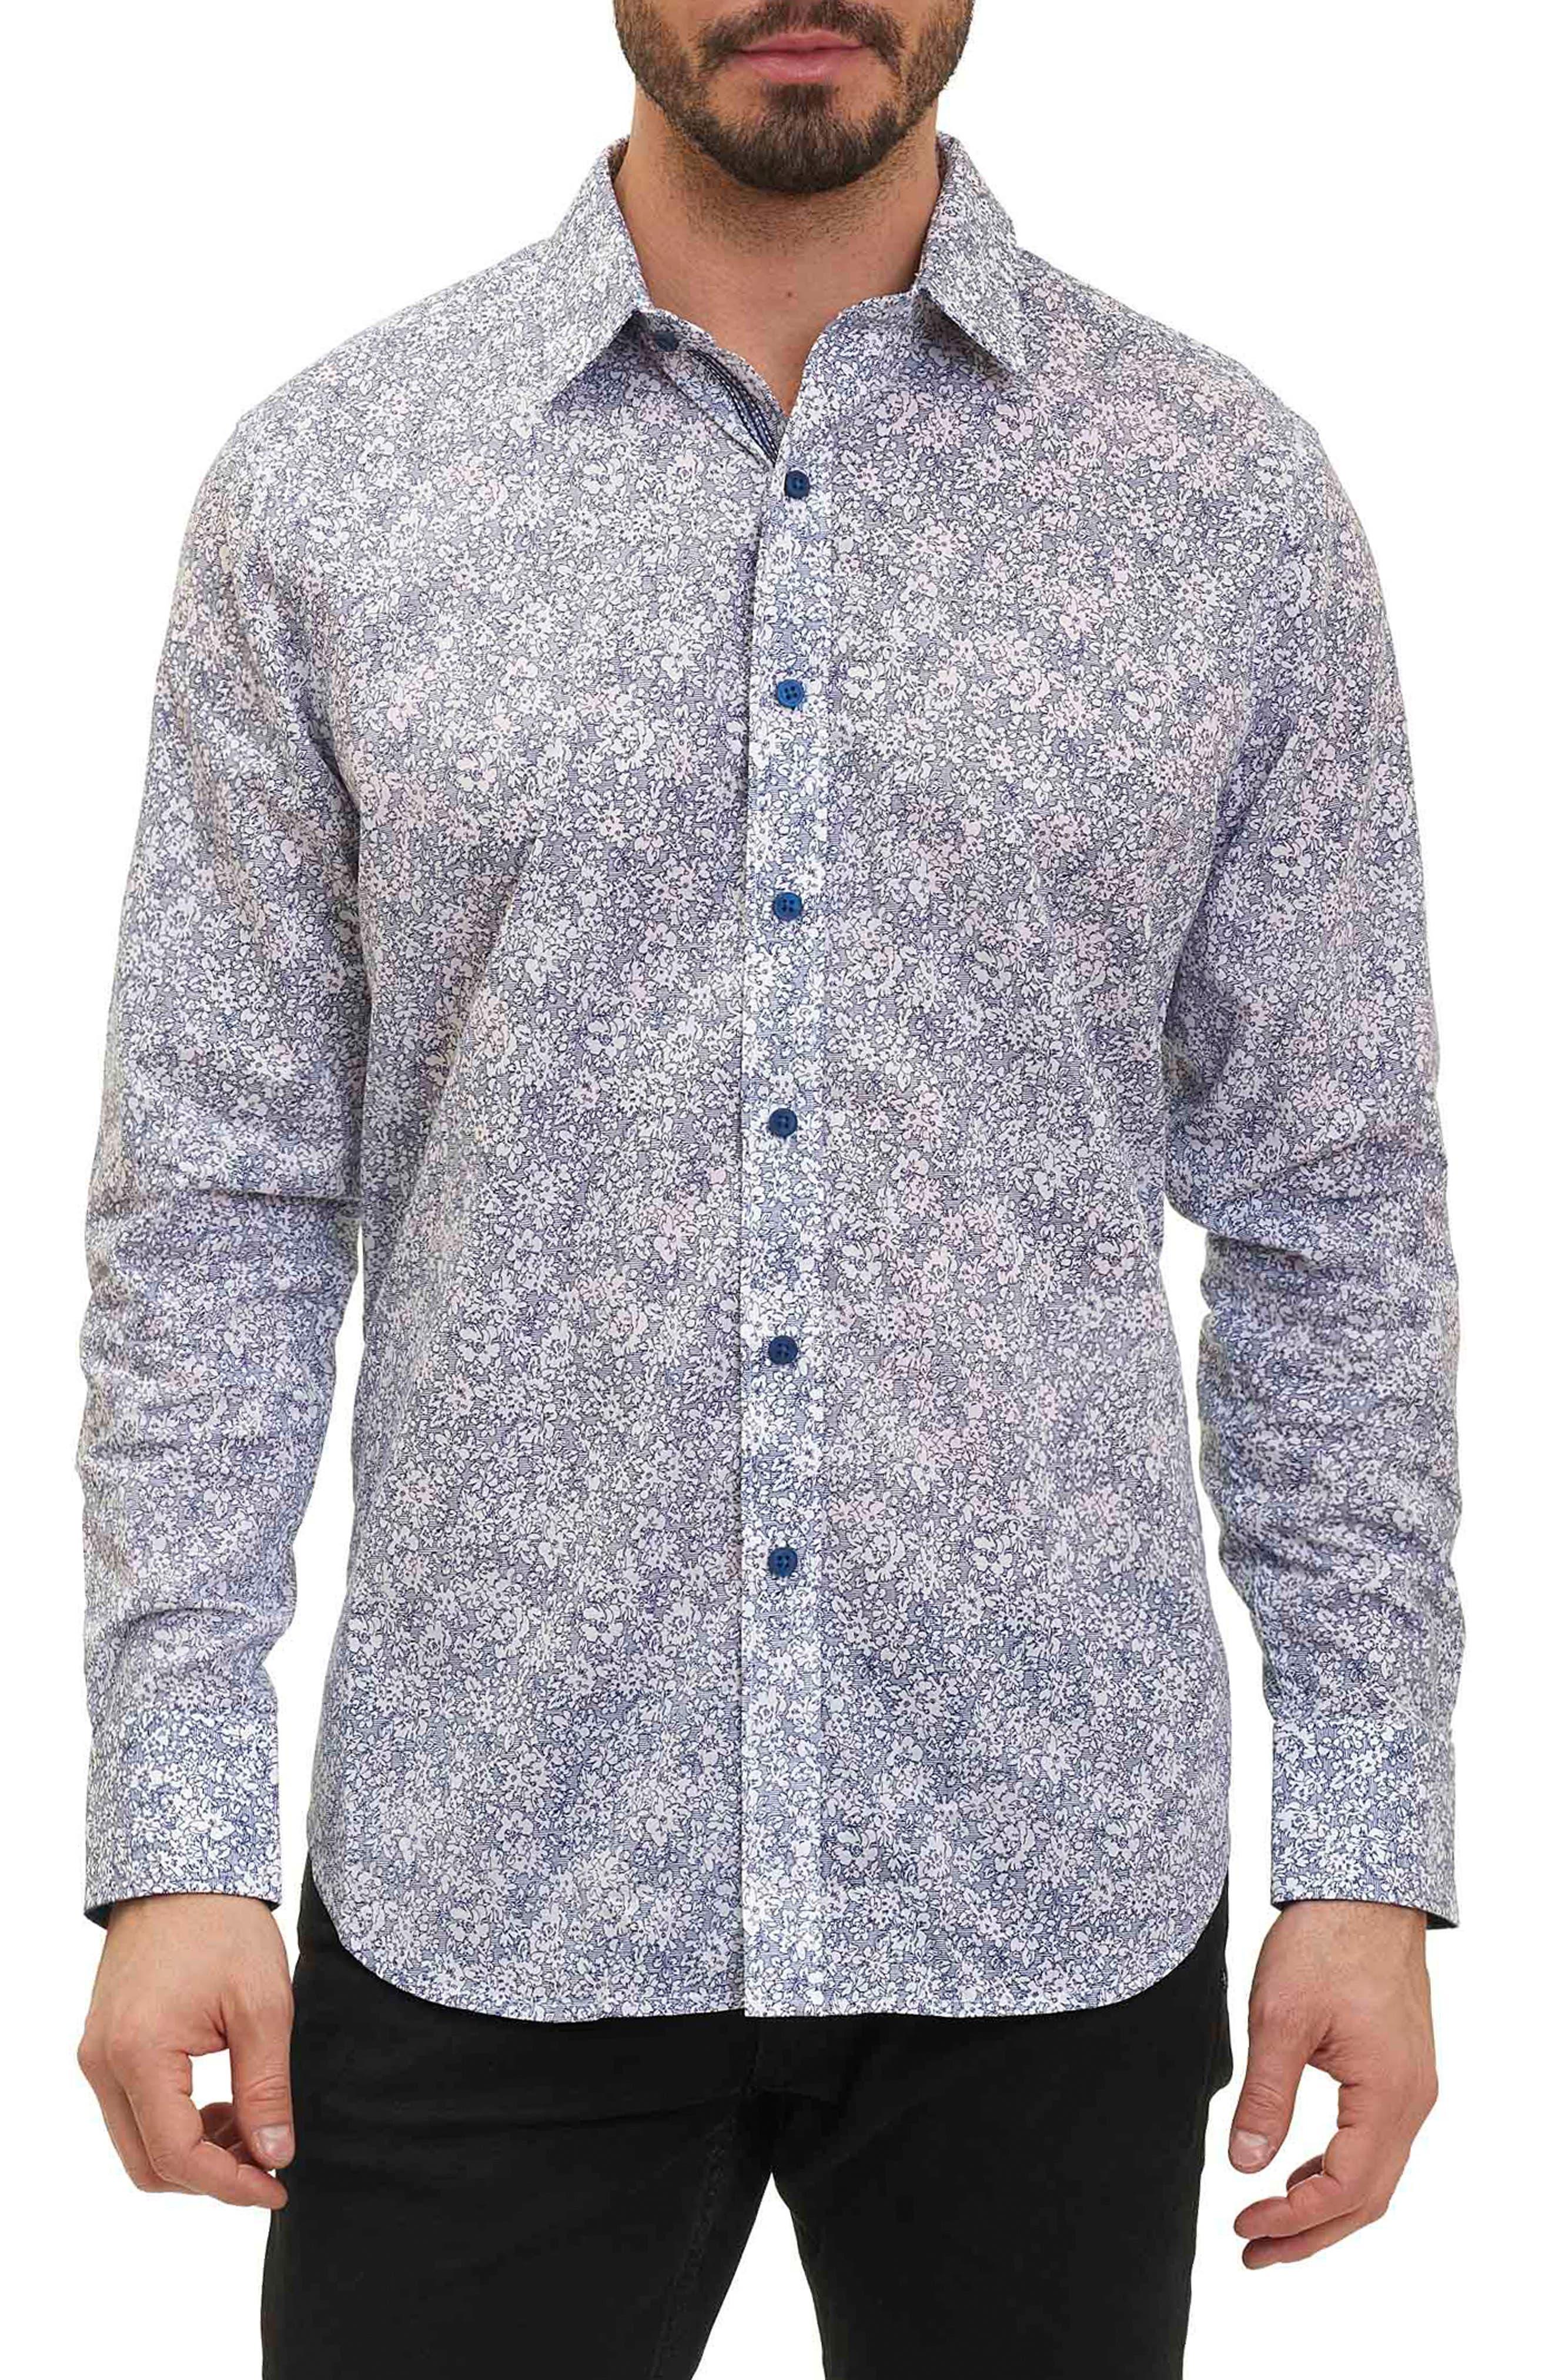 Main Image - Robert Graham Moss Landing Classic Fit Floral Print Sport Shirt